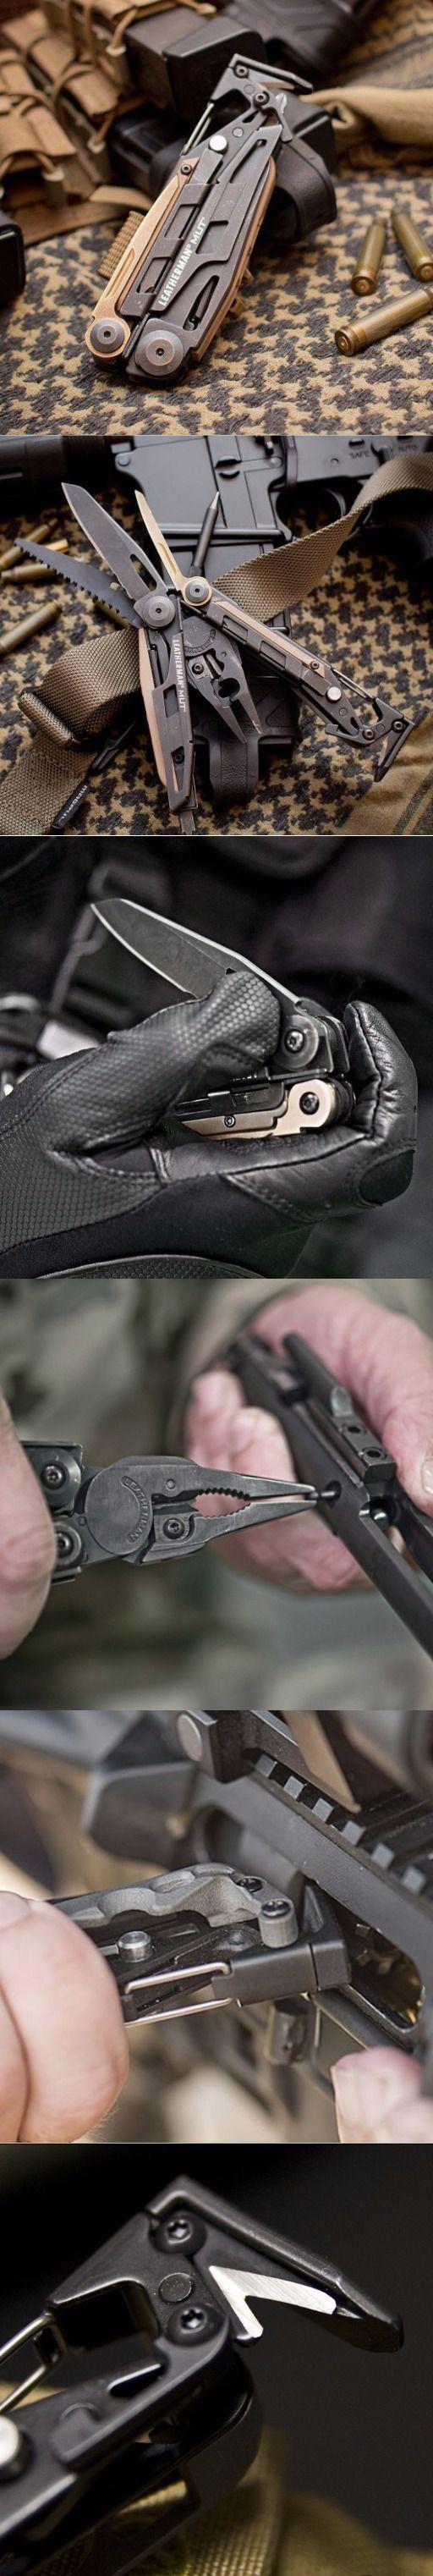 Leatherman - MUT EDC Multi Tool Rifle Maintenance Tool, Black with Molle Brown Sheath